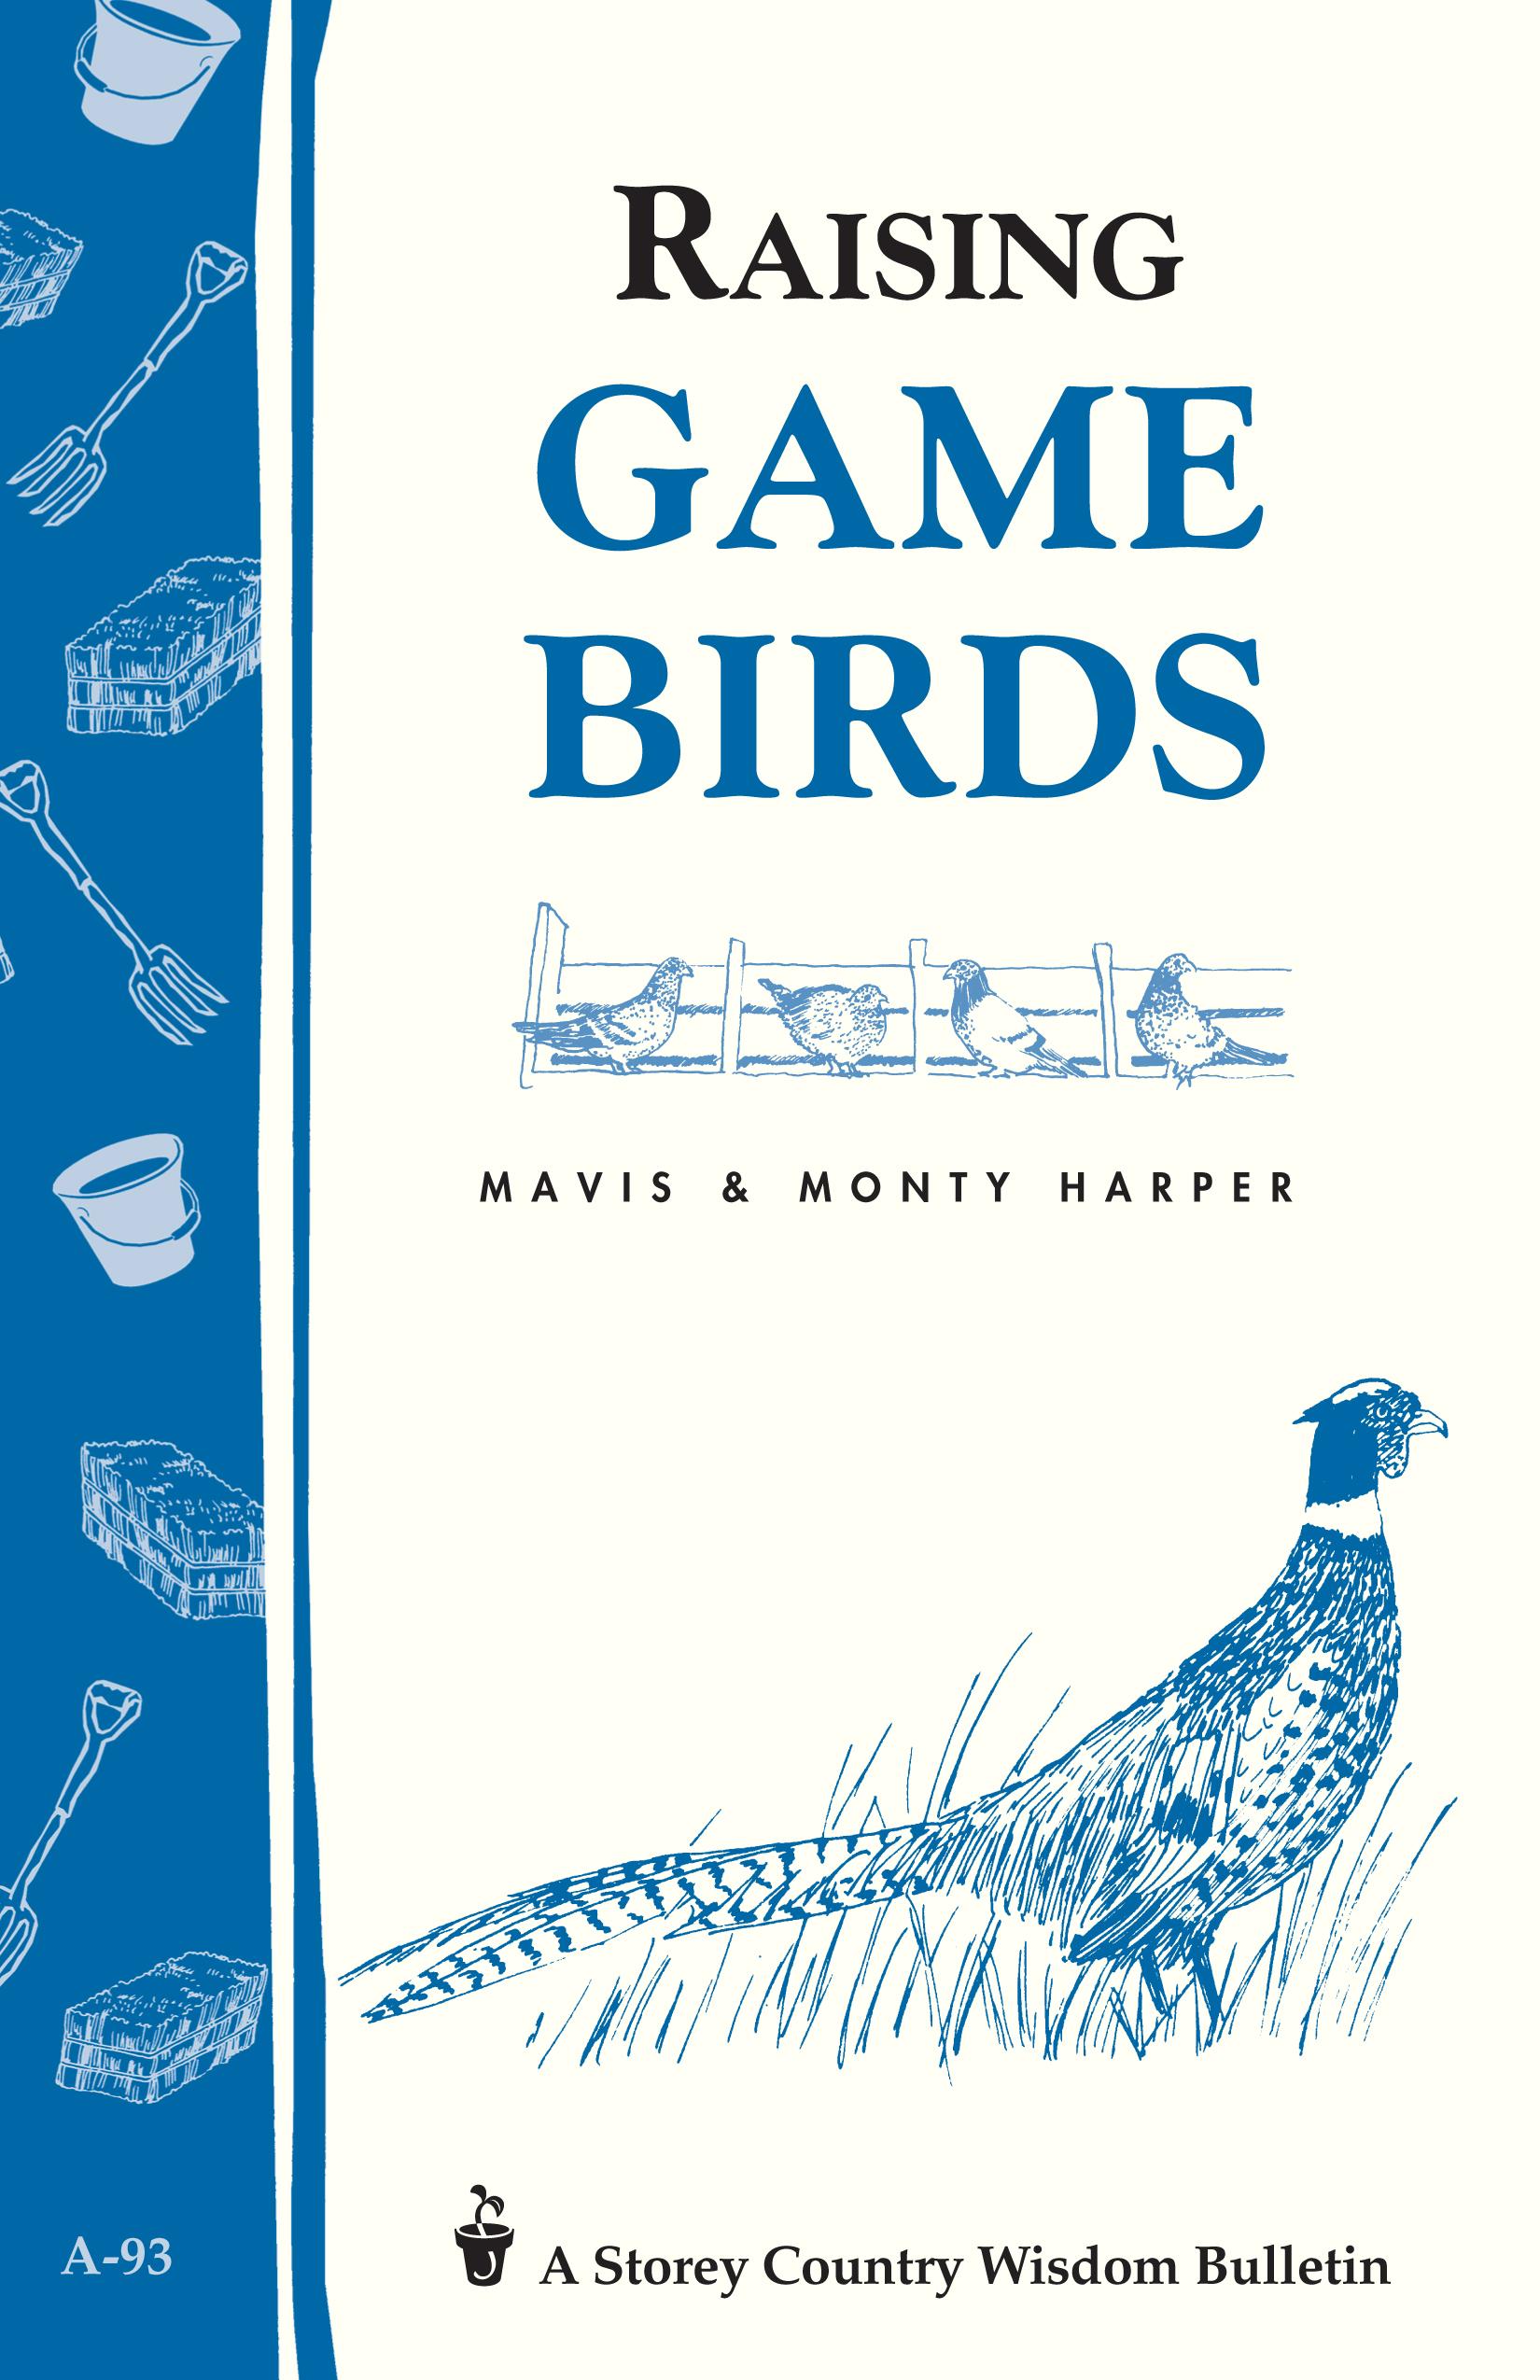 Raising Game Birds Storey's Country Wisdom Bulletin A-93 - Mavis Harper